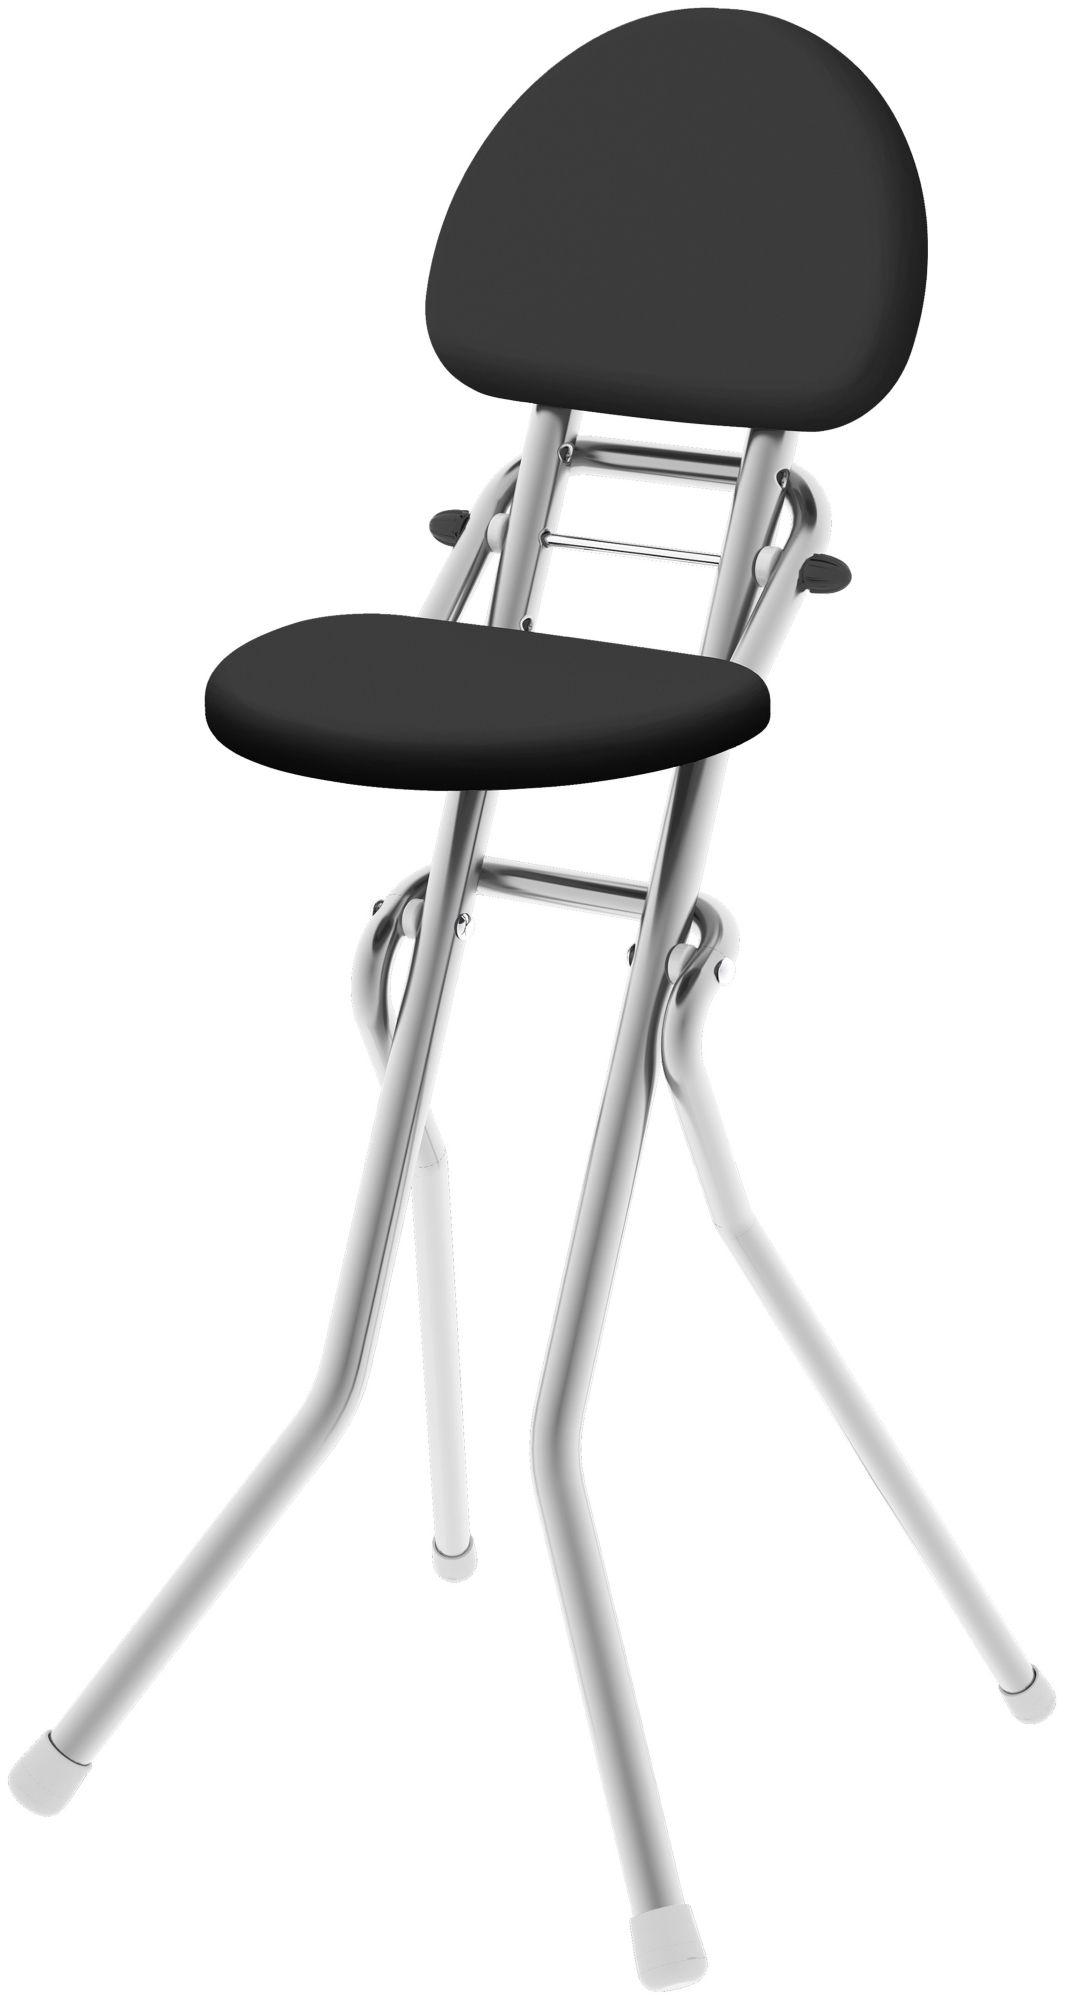 COLOMBO NEWSCAL Colombo Newscal Bügelbrett Stehhilfe »Amigo« mit gepolsterter Rückenlehne